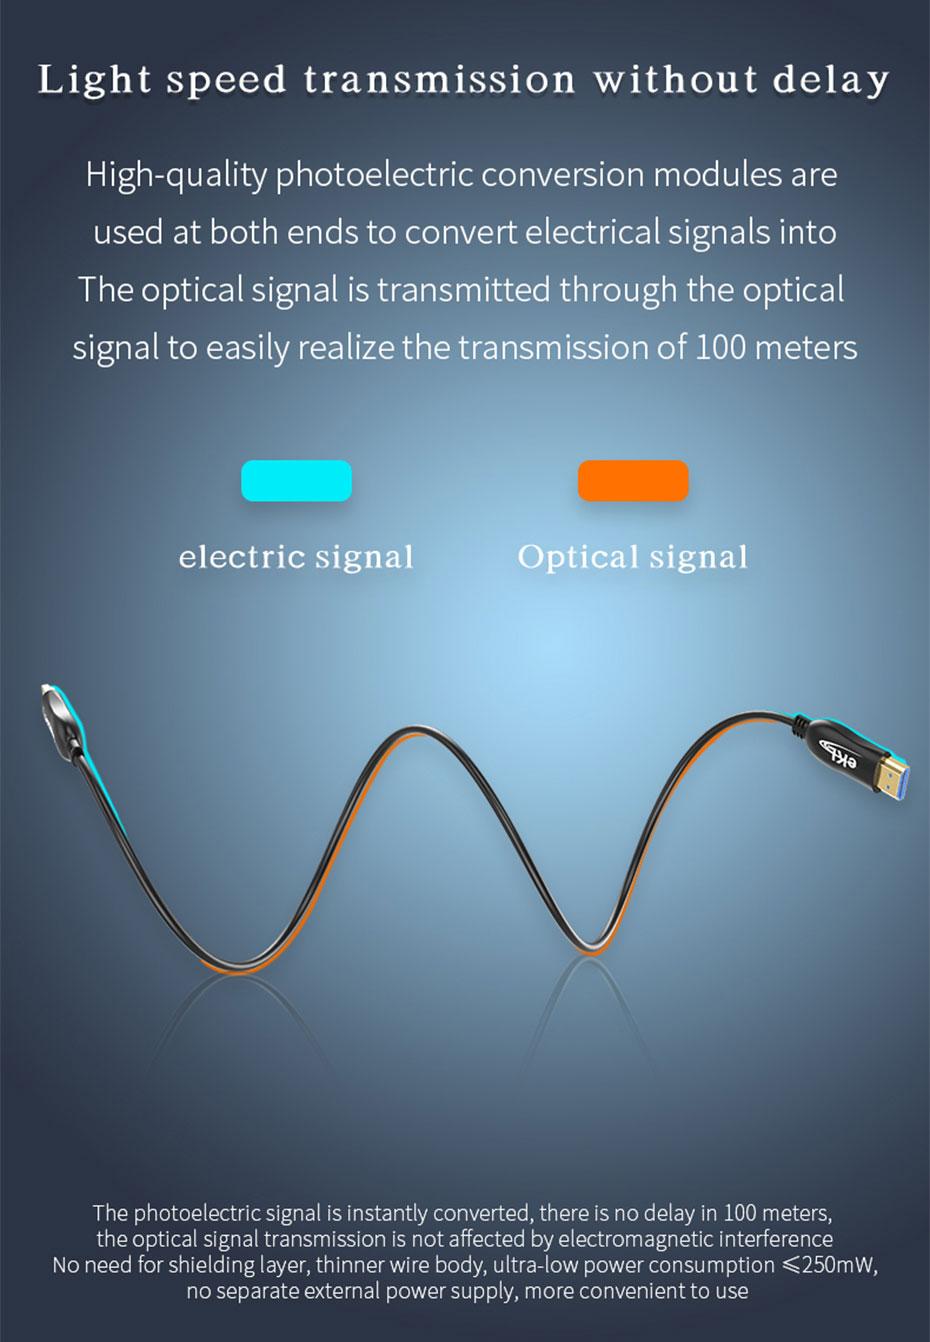 HDMI optical fiber line light speed transmission, no delay